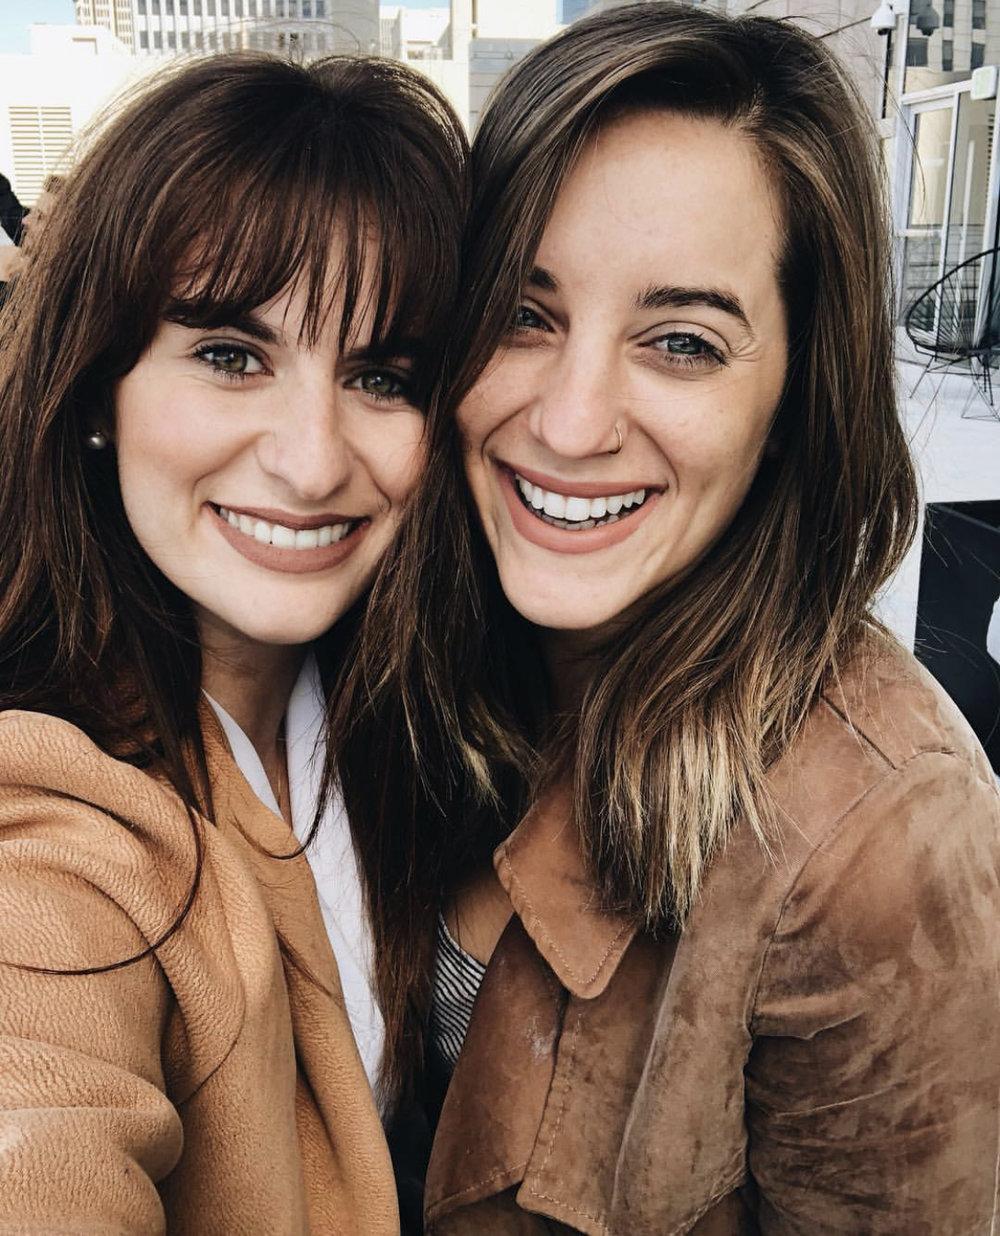 Anna and Jenna